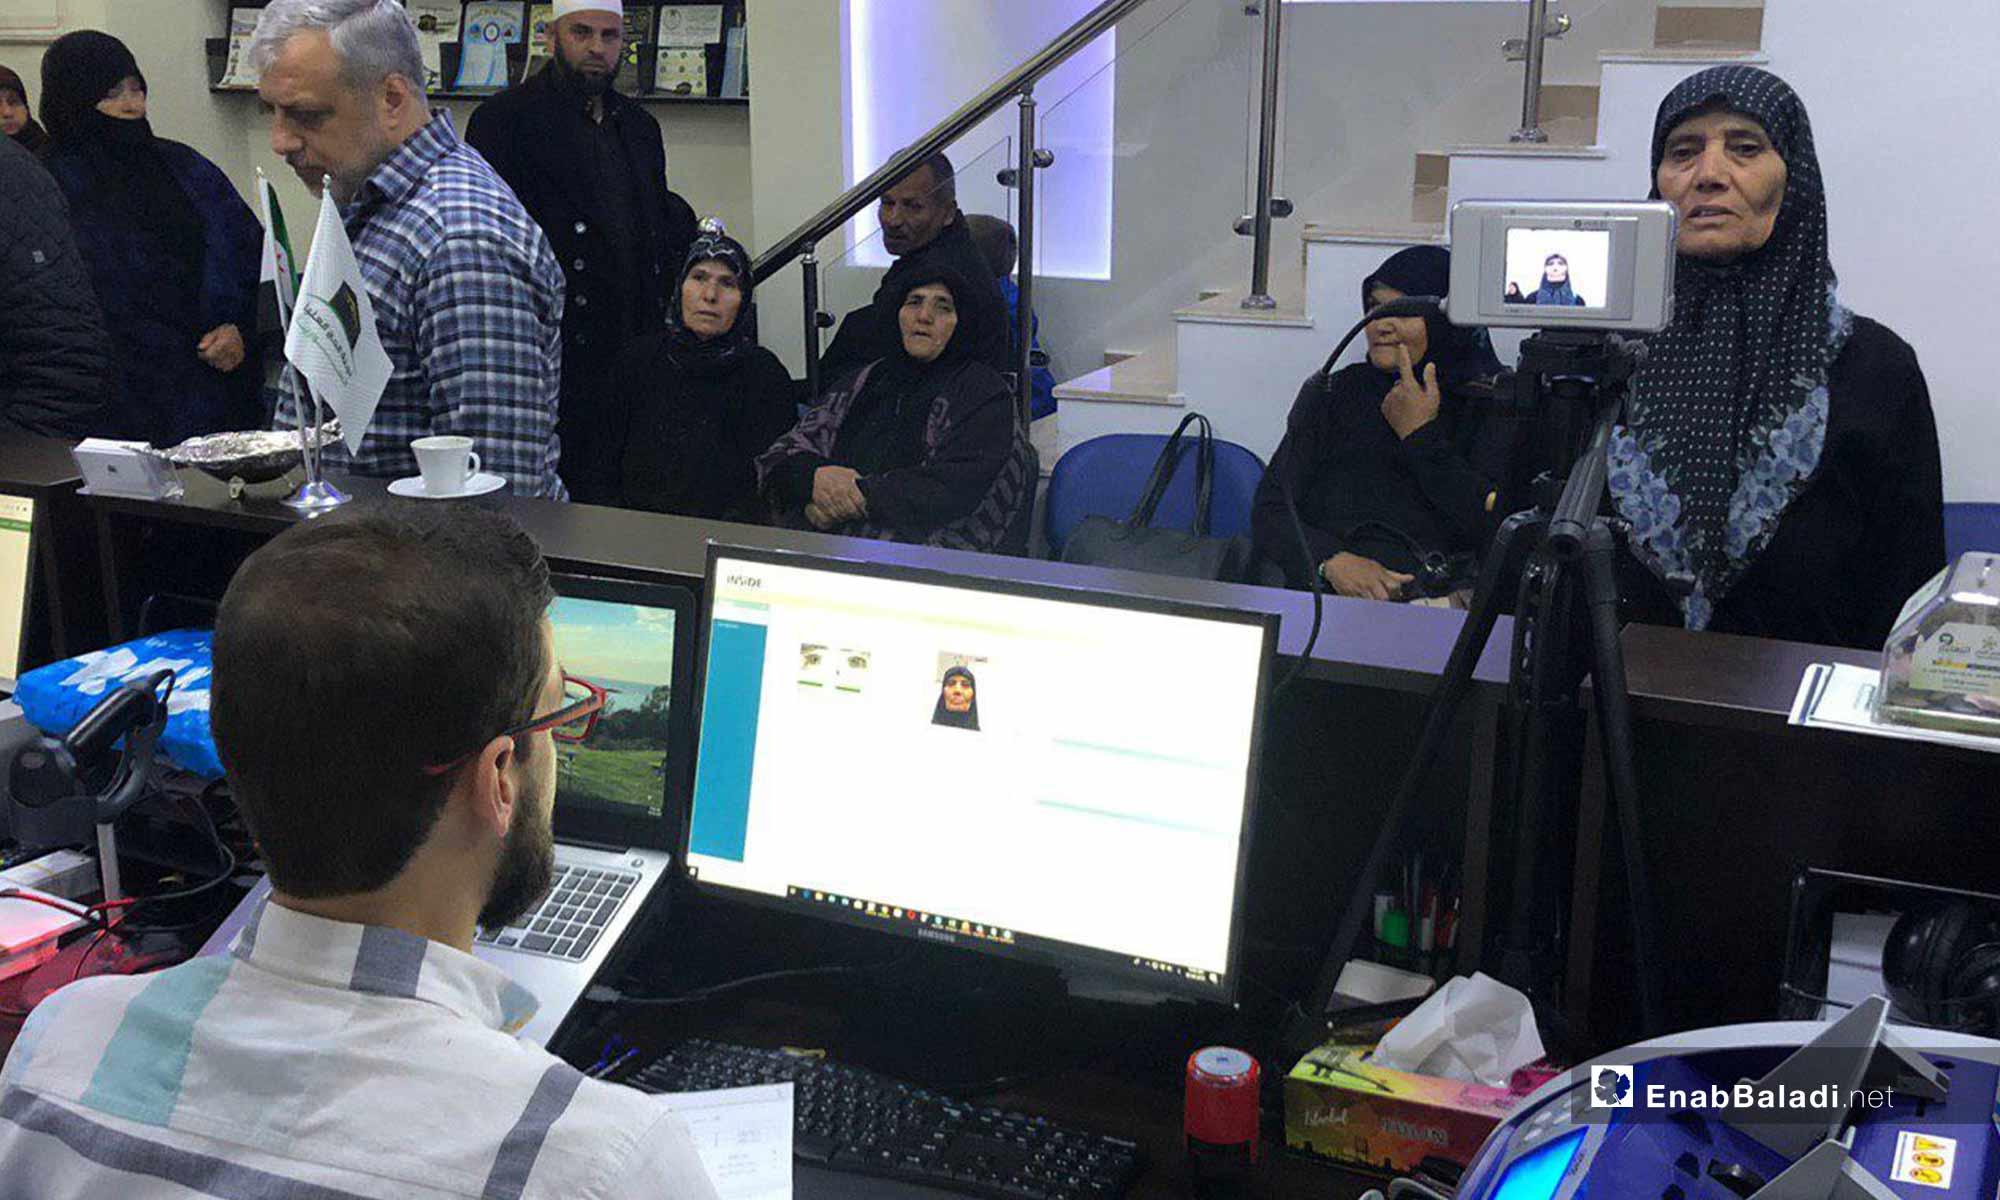 Registering the names of the Syrian pilgrims who wish to perform Hajj through Syrian Supreme Hajj Committee - March 2019 (Enab Baladi)